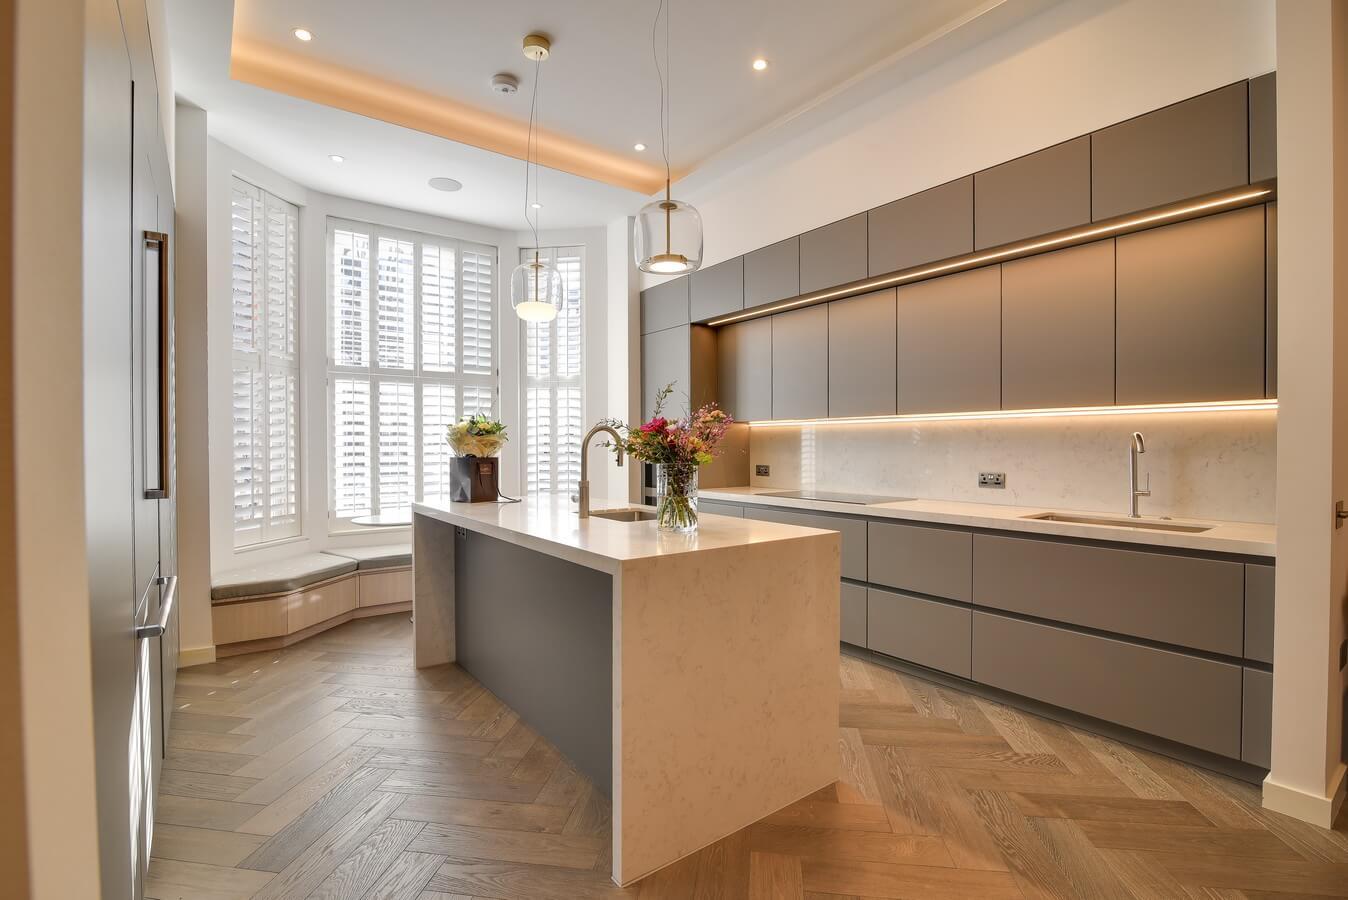 Marylebone-London-Germany-Kitchen-Design.jpg